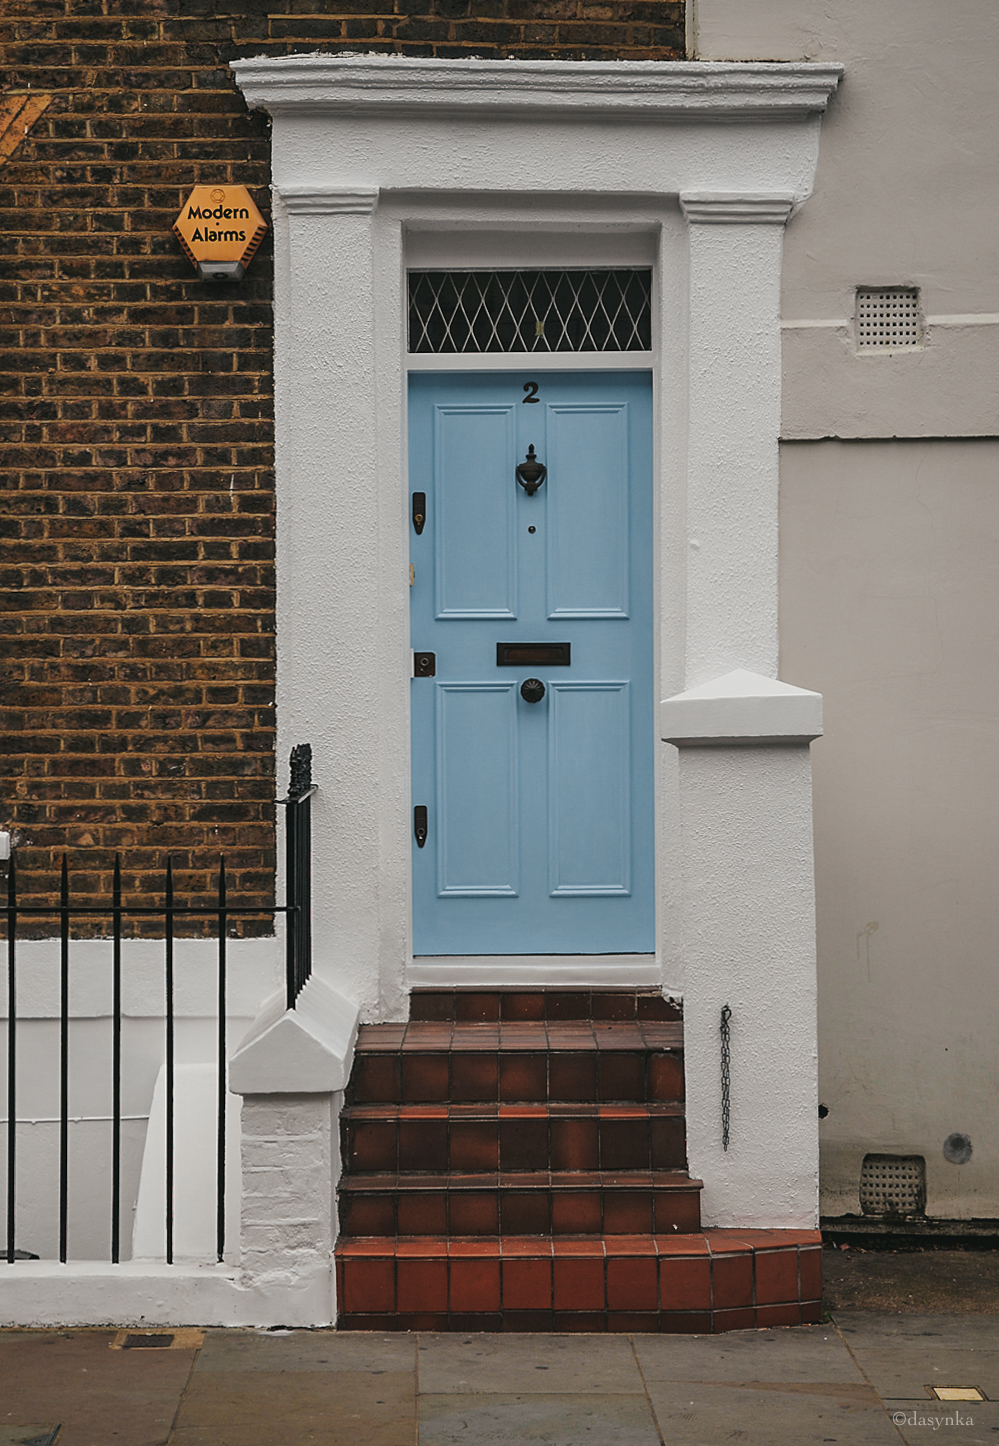 dasynka-fashion-blogger-blog-notting-hill-globetrotter-travel-london-door-blue